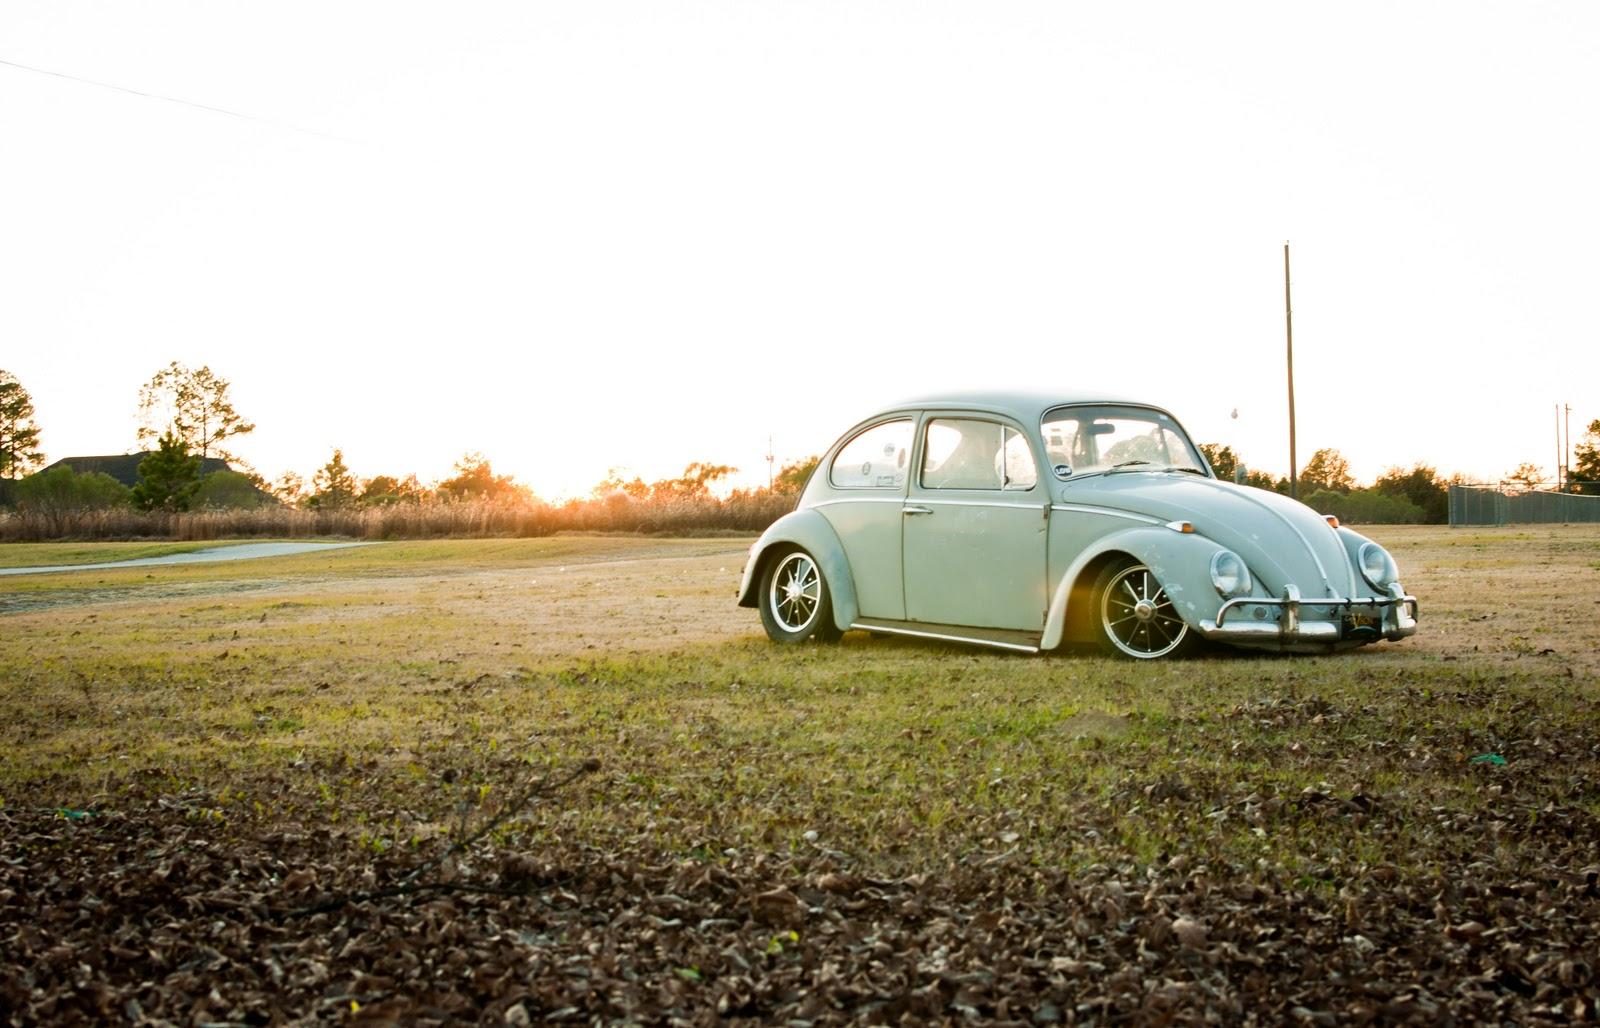 Otis - my '65 Beetle DSC_0024